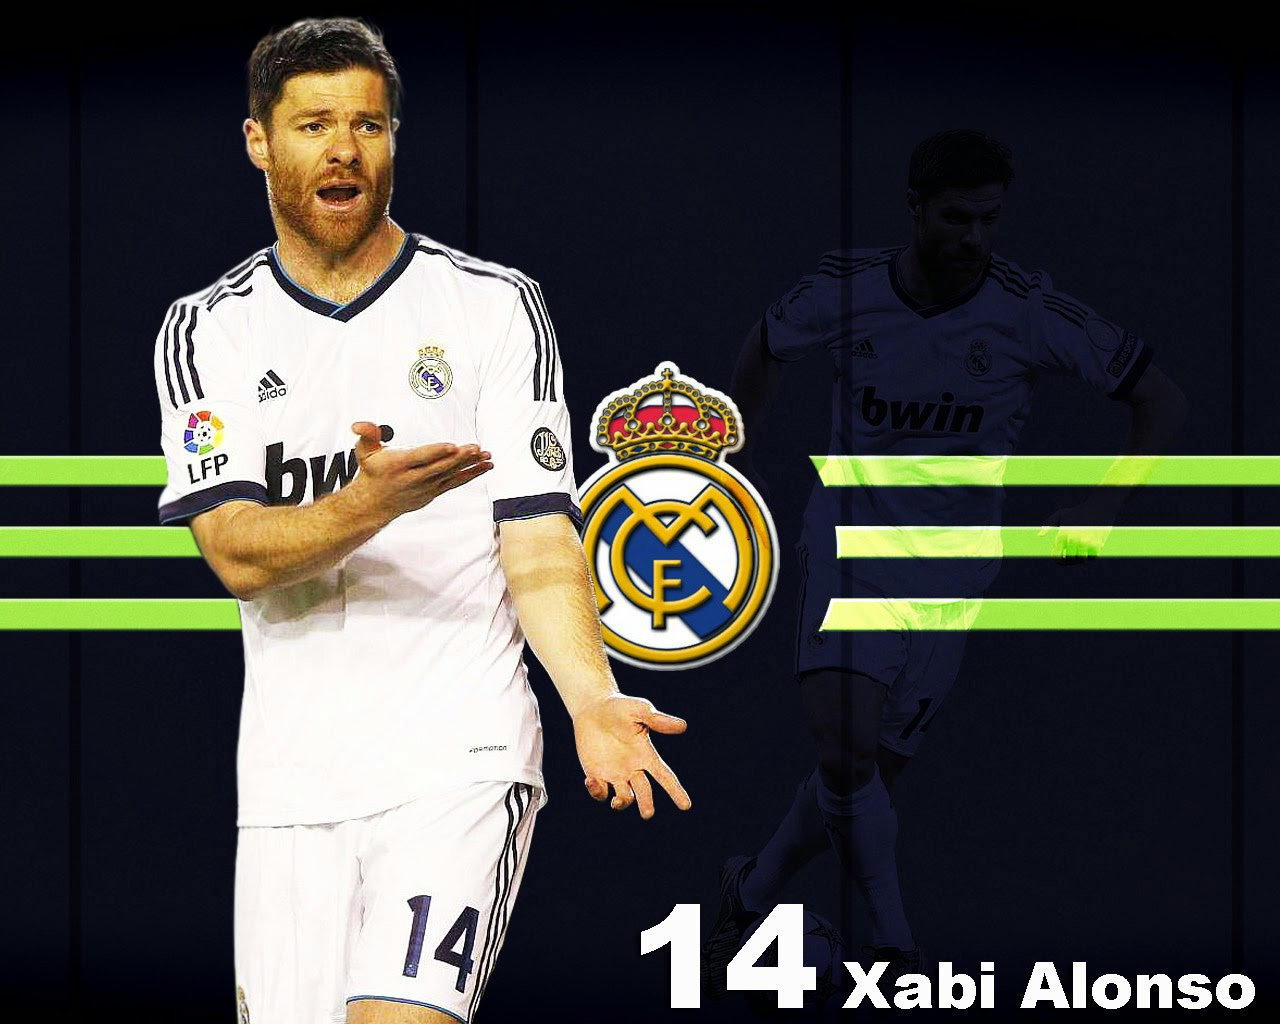 Xabi Alonso Real Madrid Wallpaper   Player Football Wallpaper 1280x1024